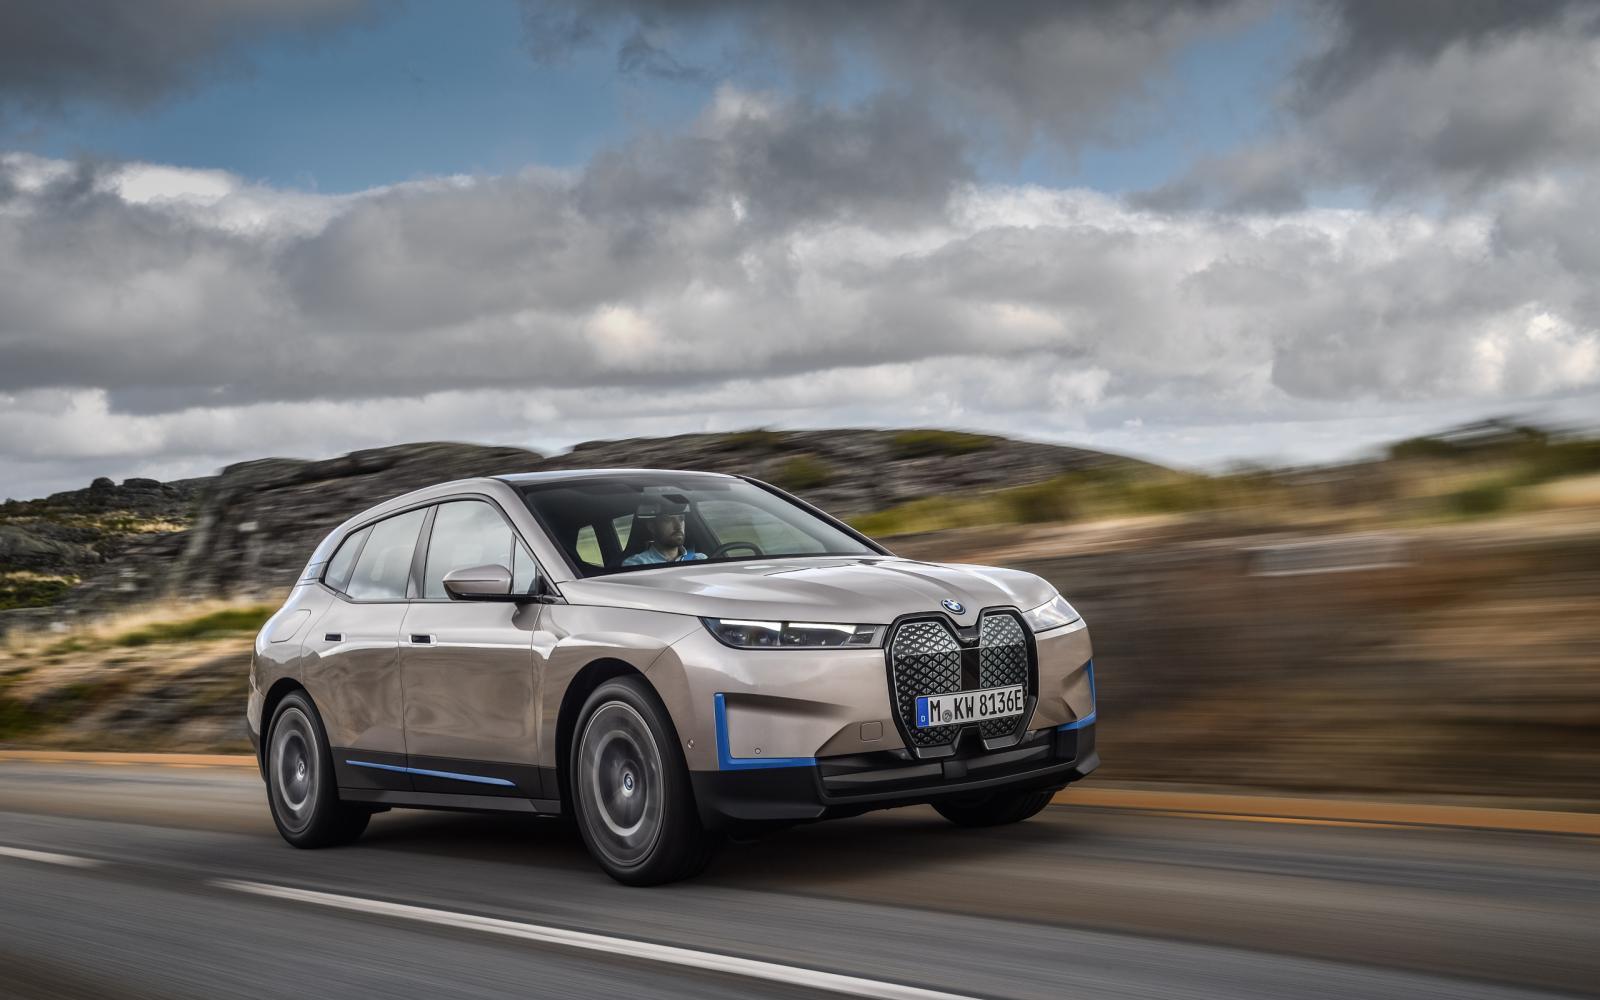 BMW iX-lancering: BMW biedt excuses aan na beledigen doelgroep